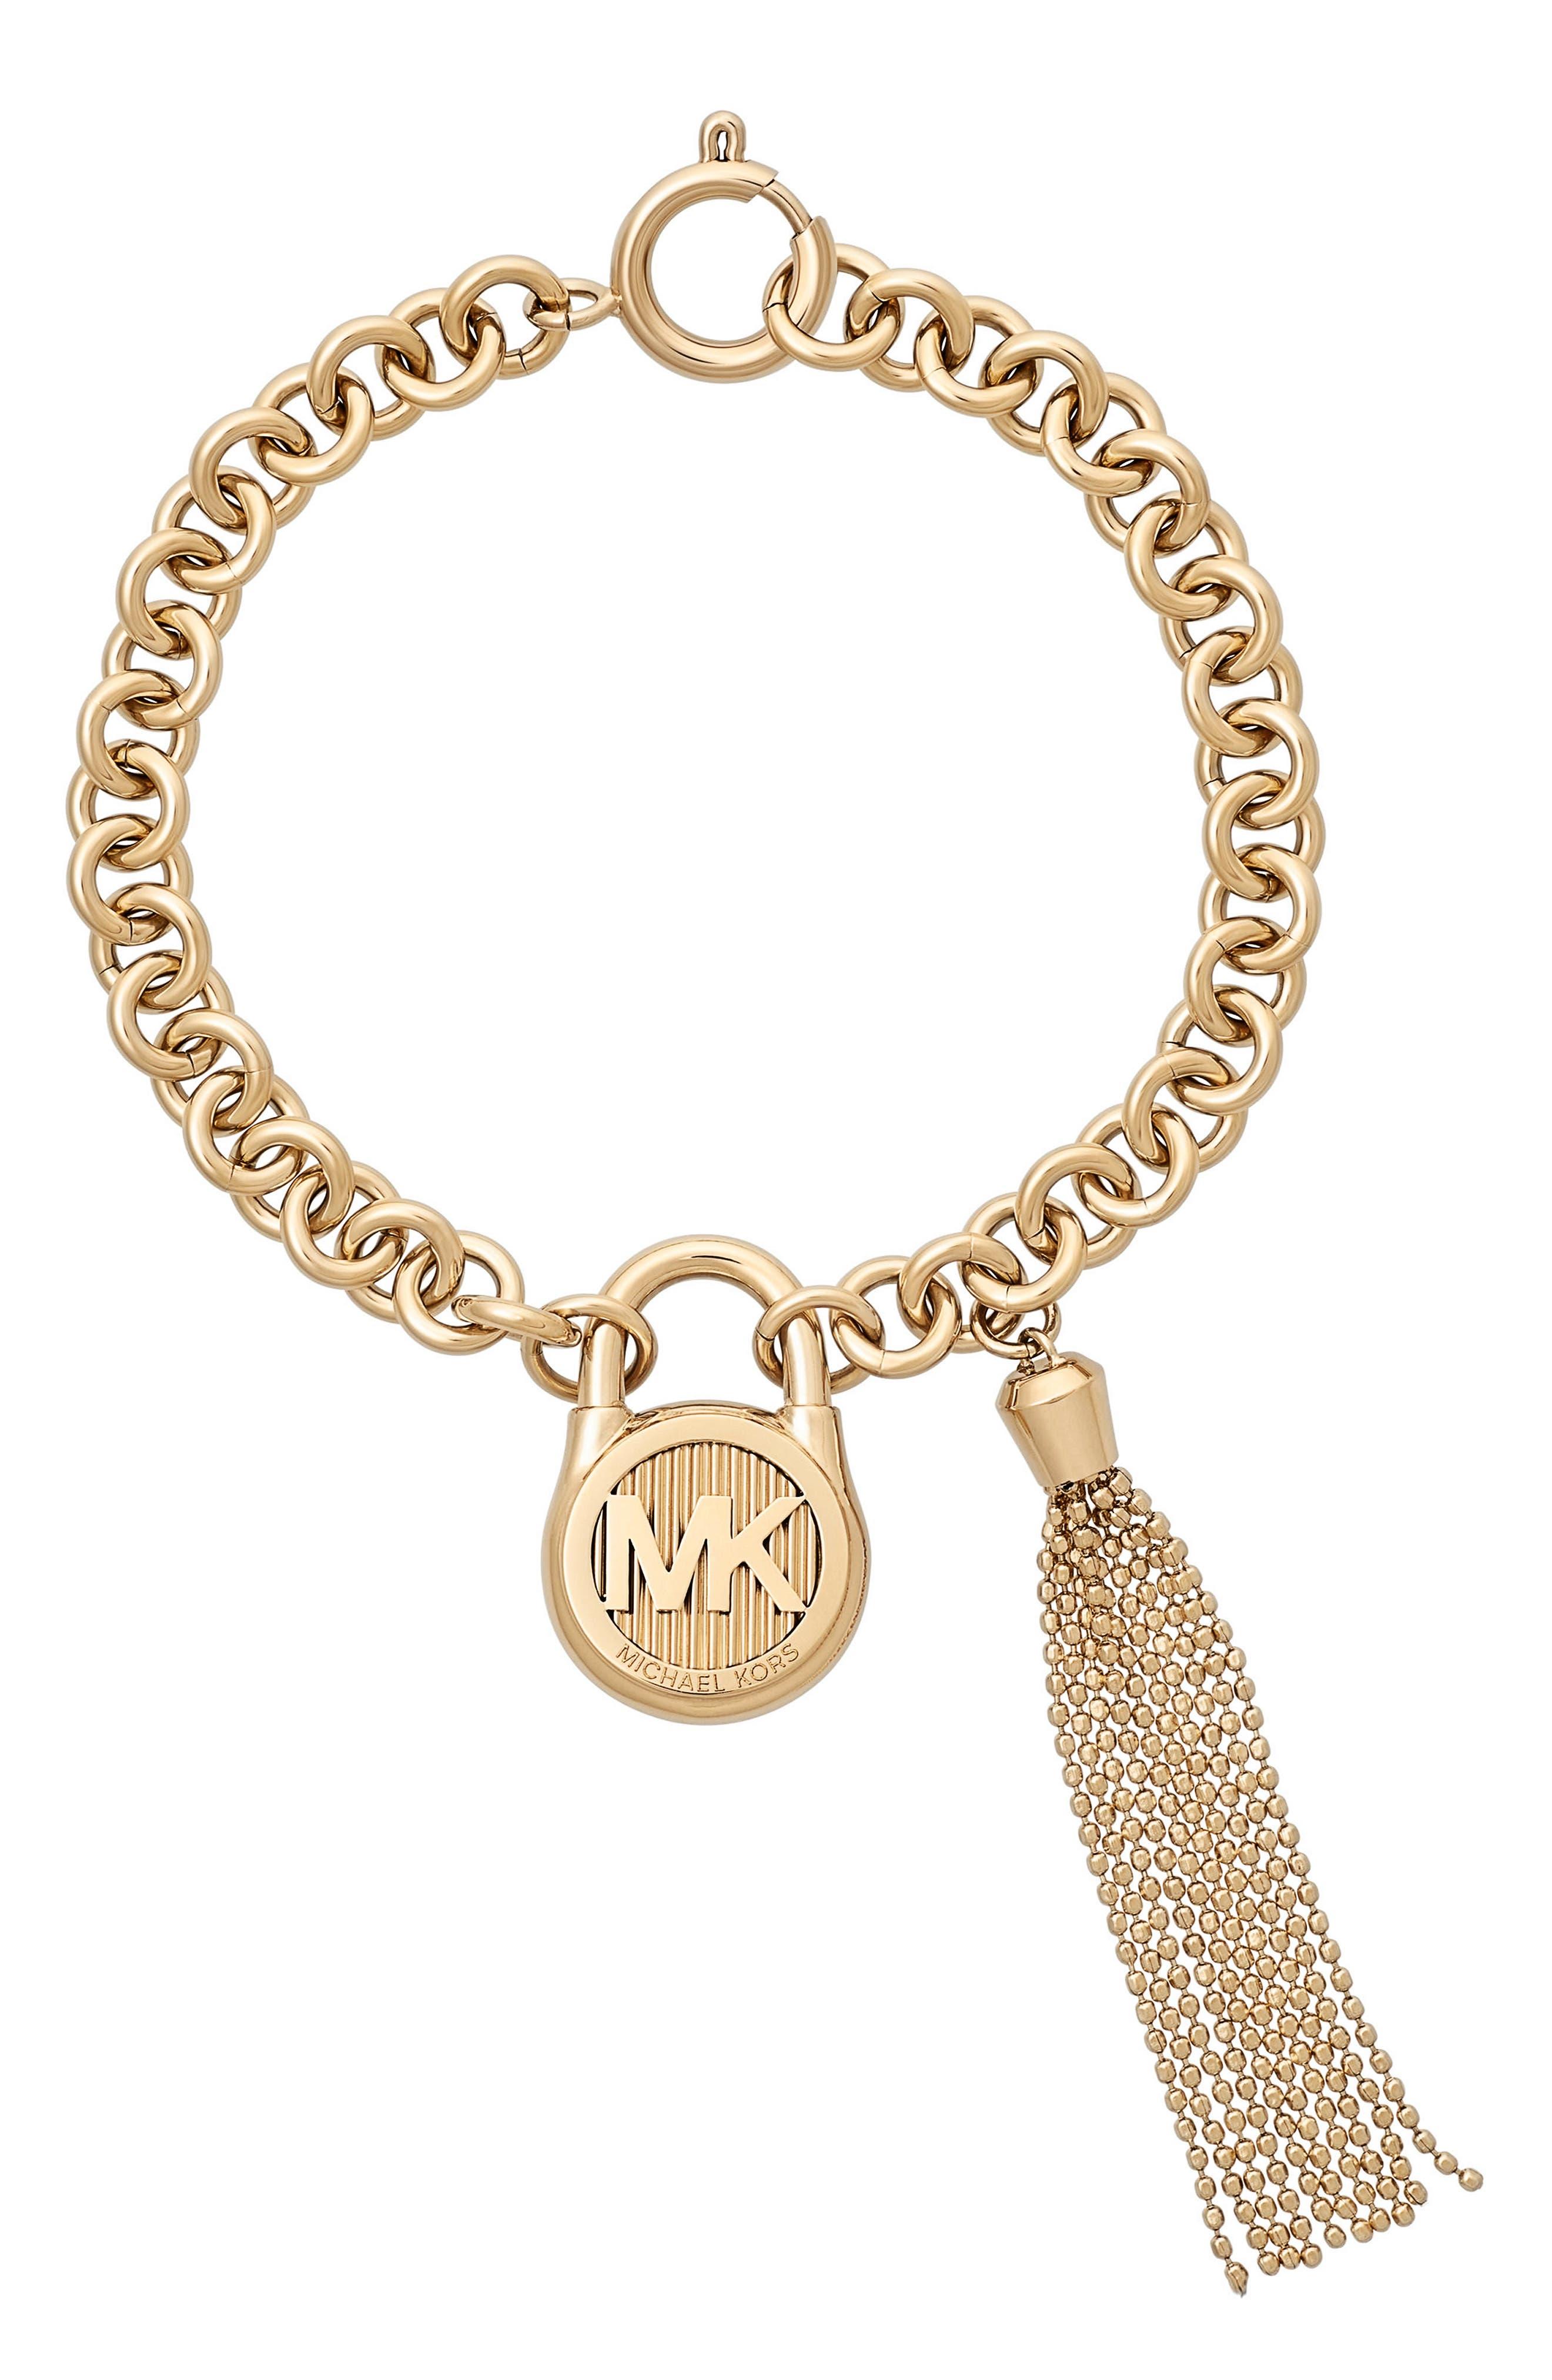 Alternate Image 1 Selected - Michael Kors Link Charm Bracelet